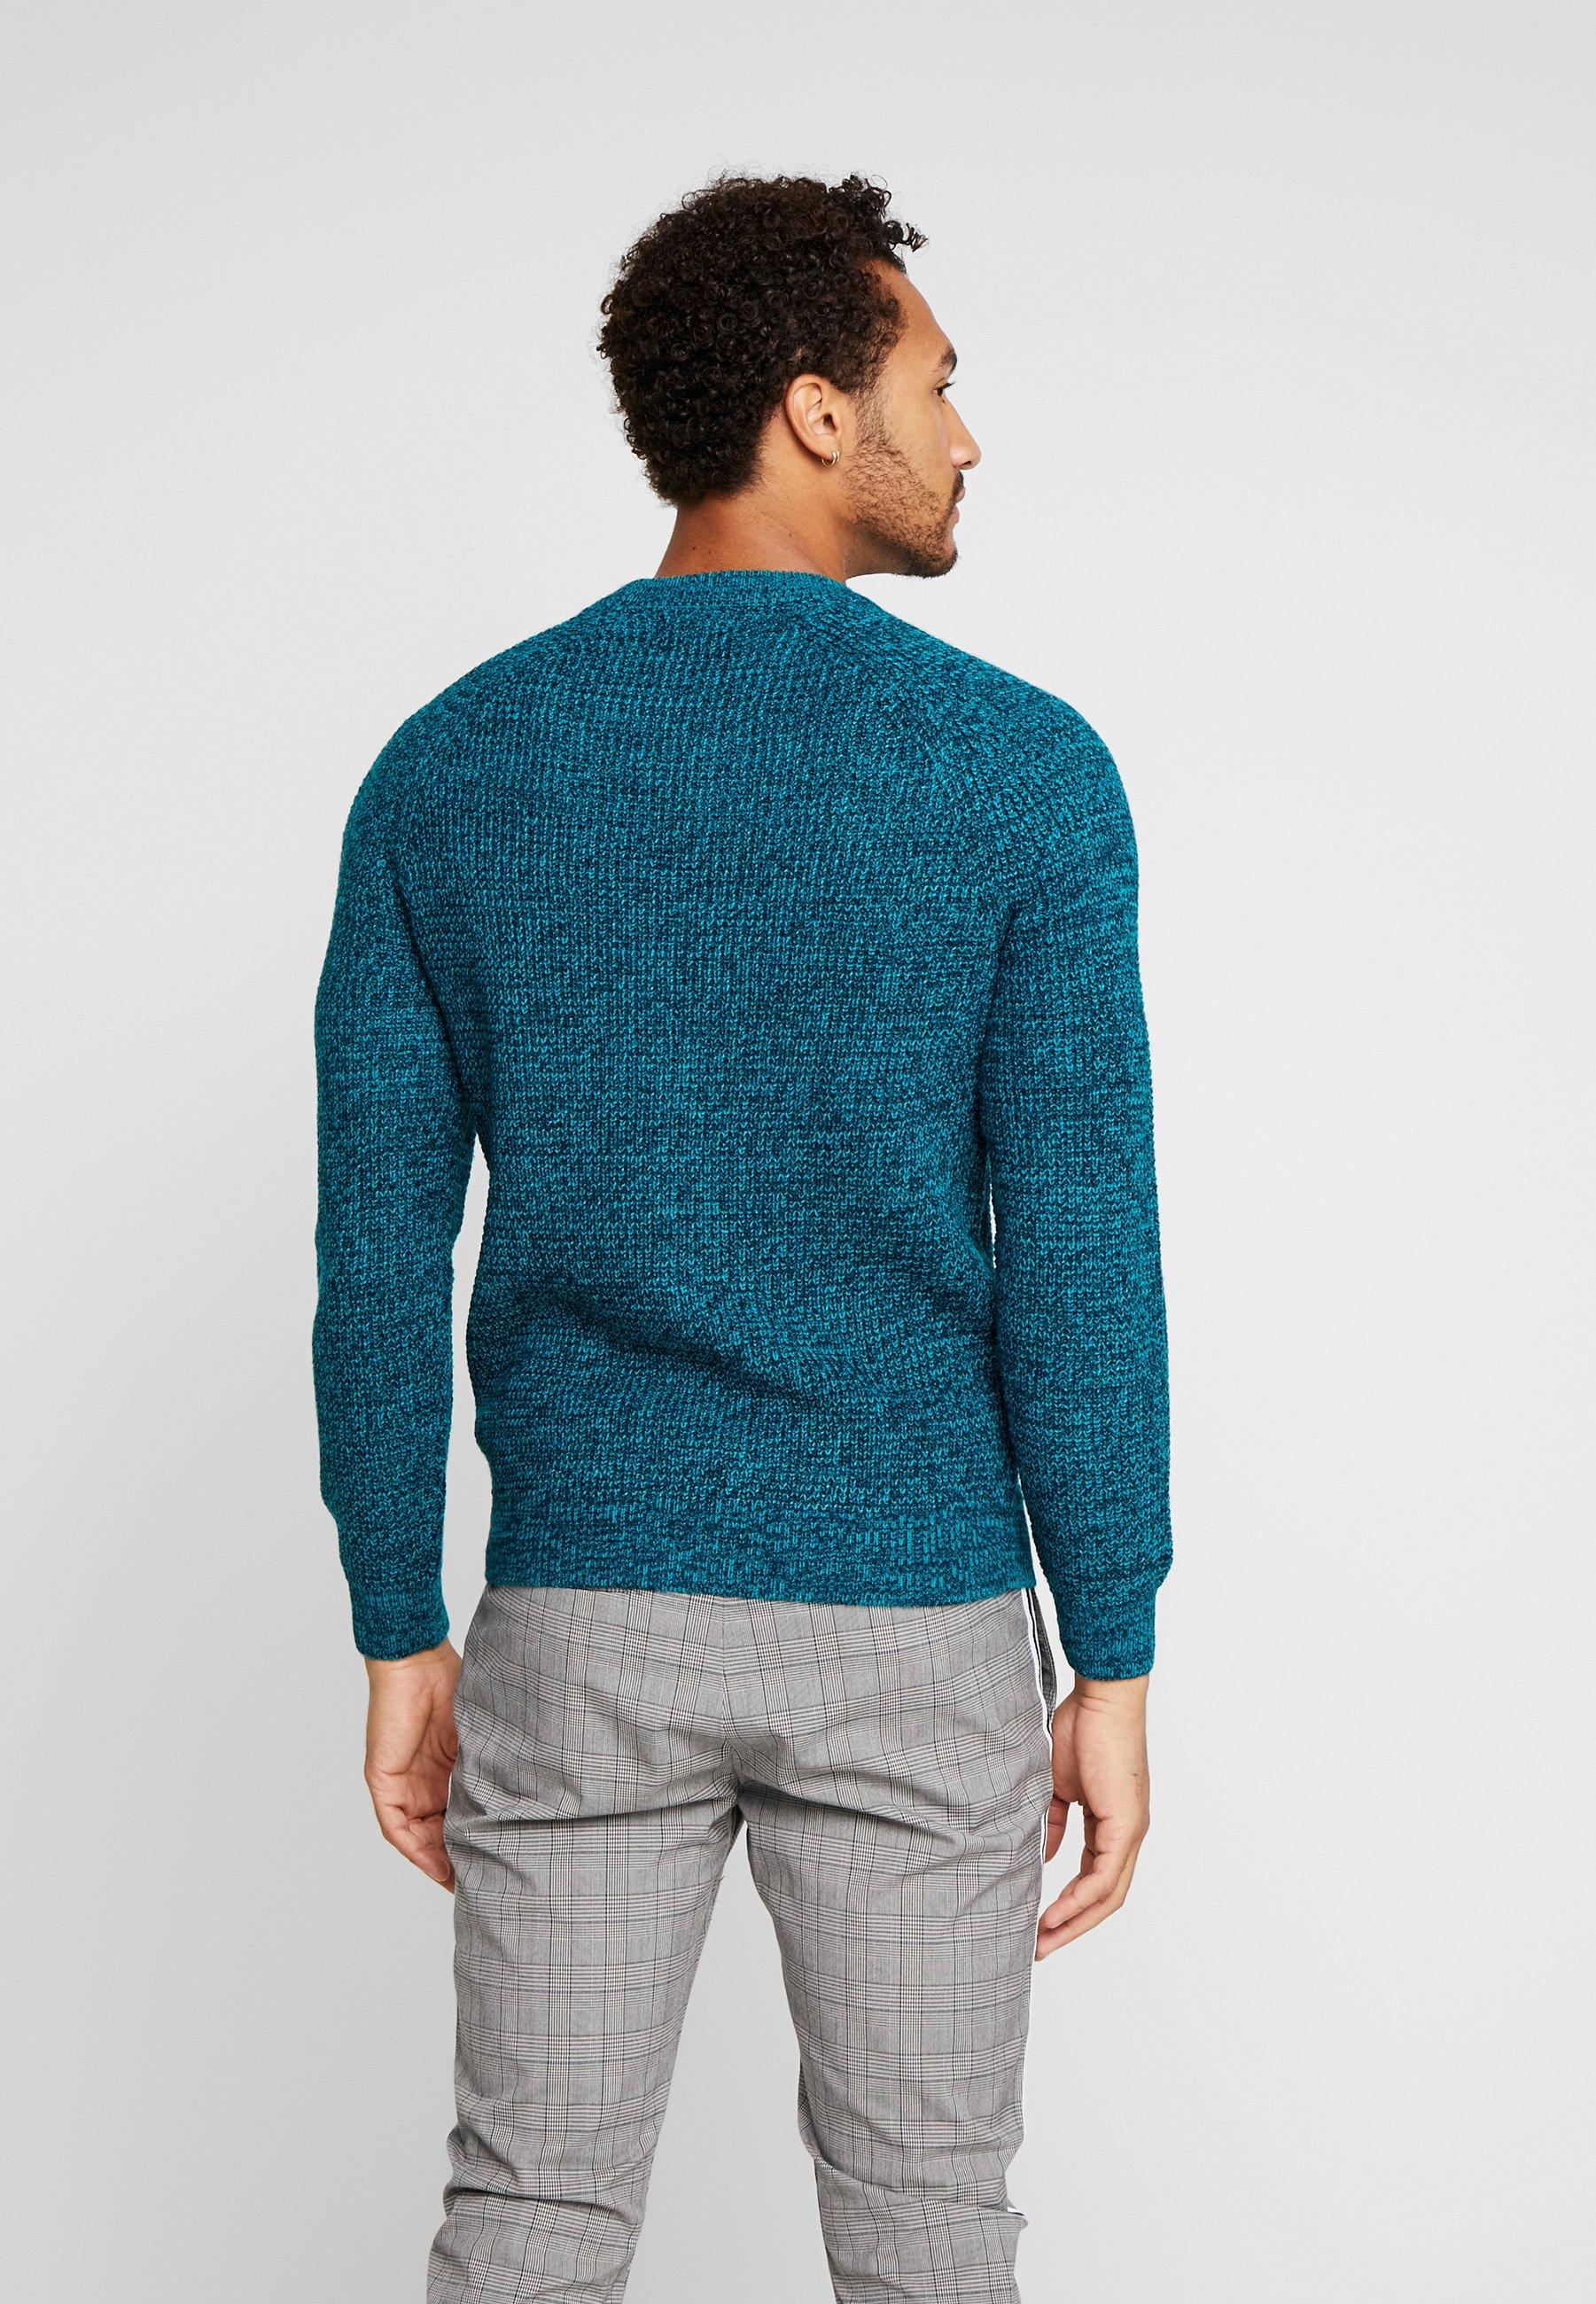 New Look RAGLAN TUCK STITCH CREW - Sweter - turquoise